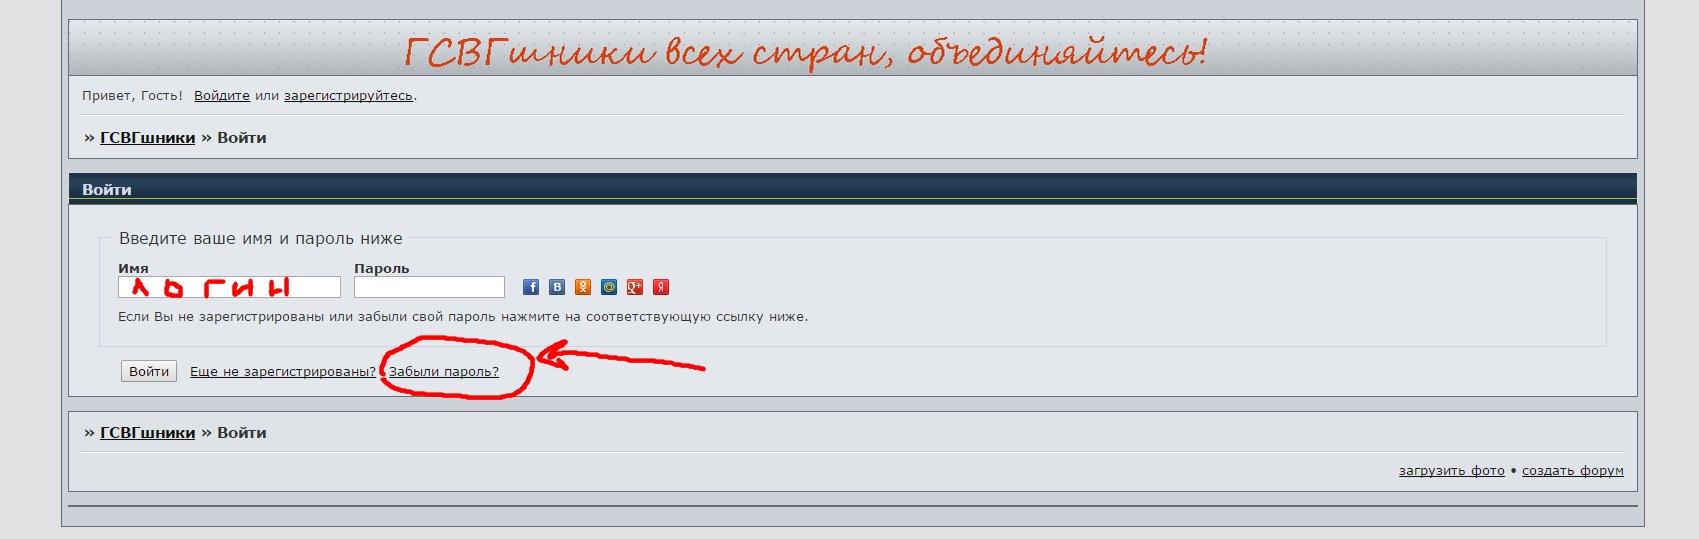 http://s3.uploads.ru/UzMCL.jpg